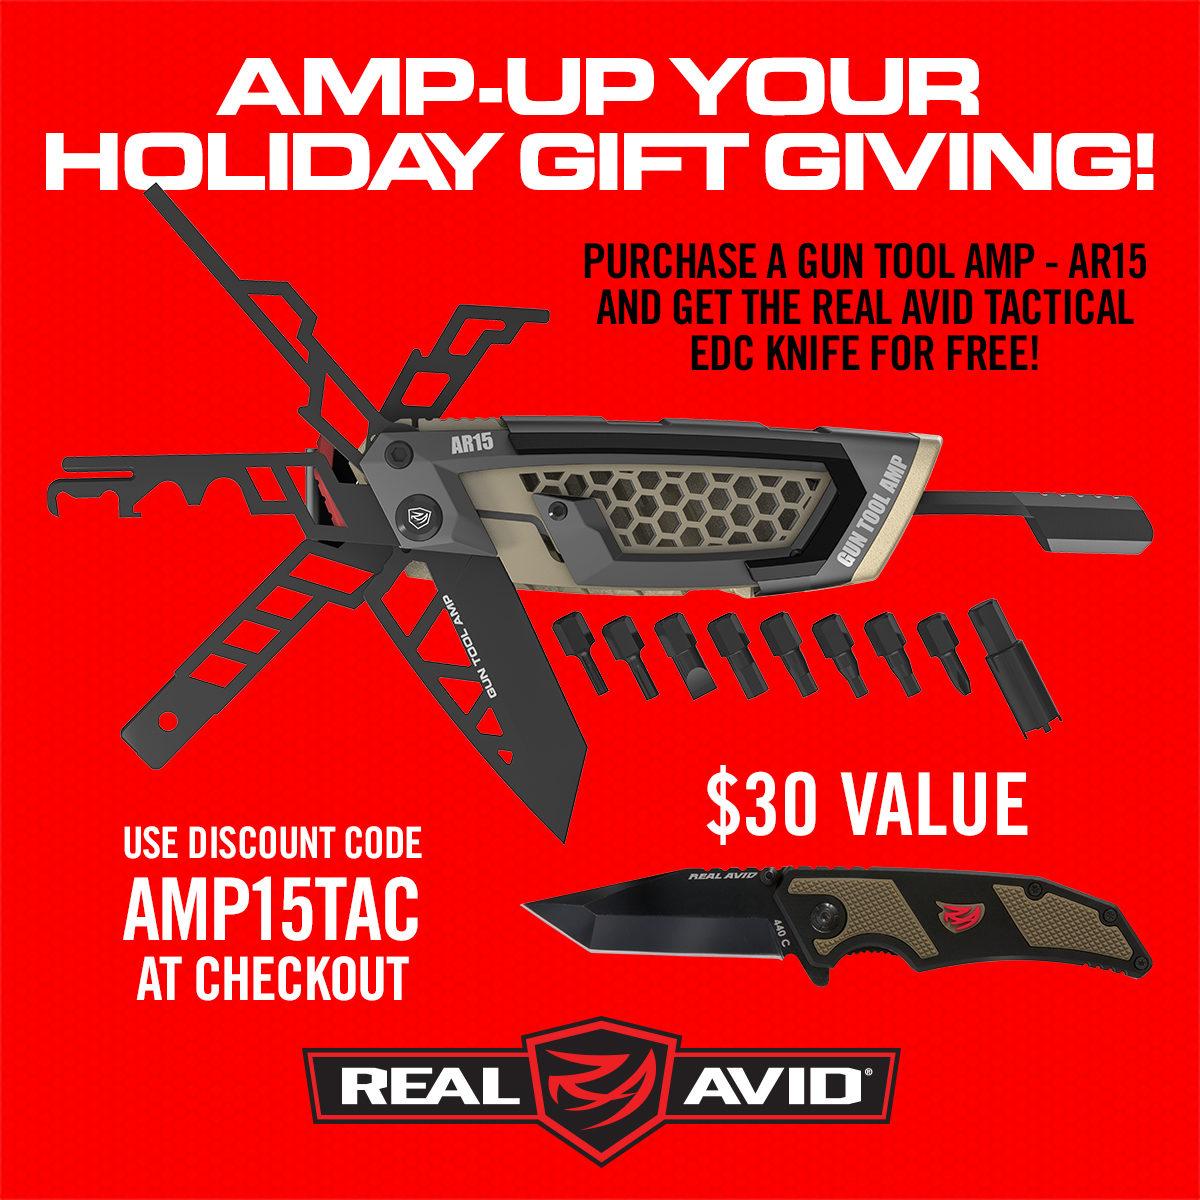 Gun Tool Amp AR15 Holiday Special